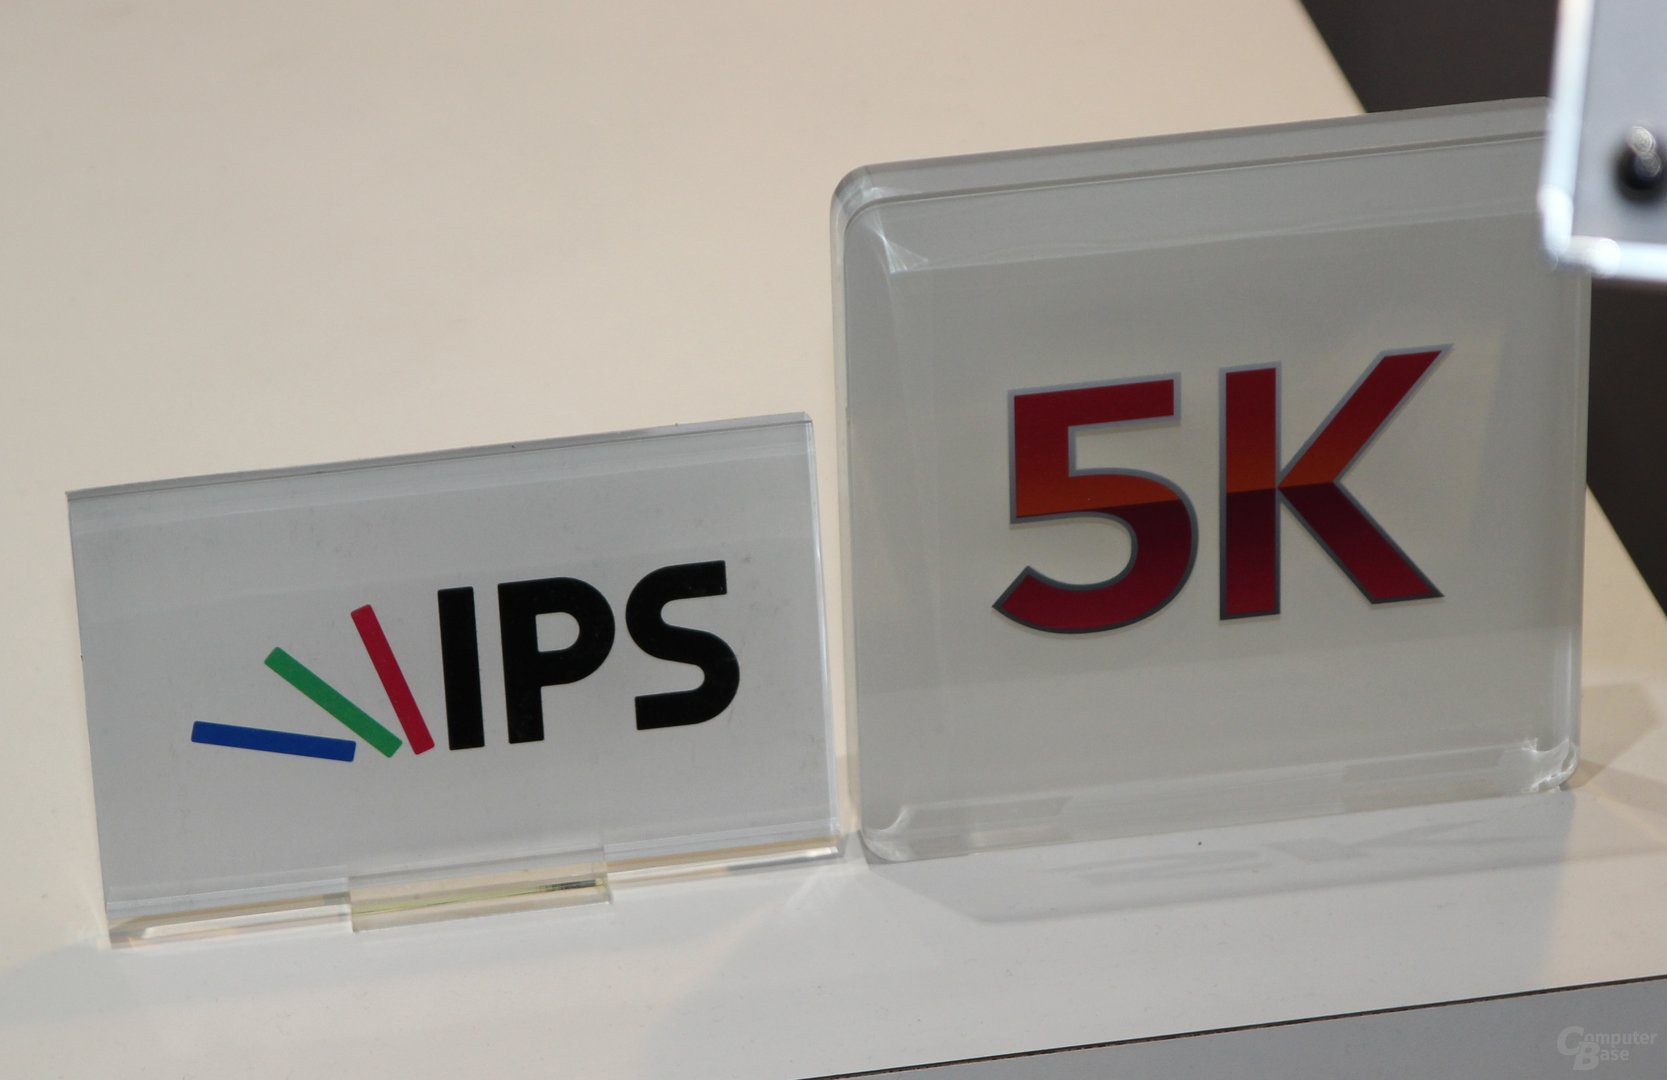 LGs 21:9-Display mit 5K-Auflösung